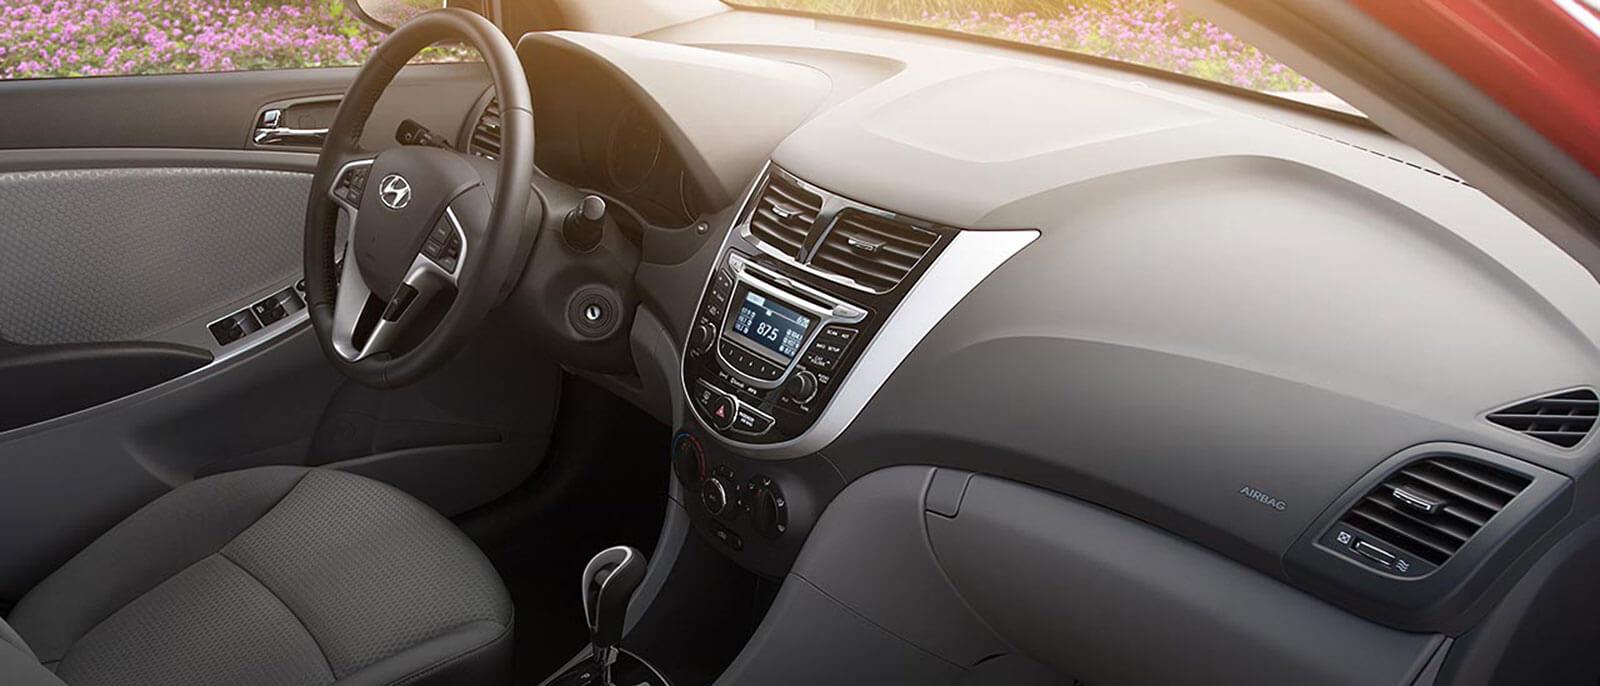 2017 Hyundai Accent interior dashboard